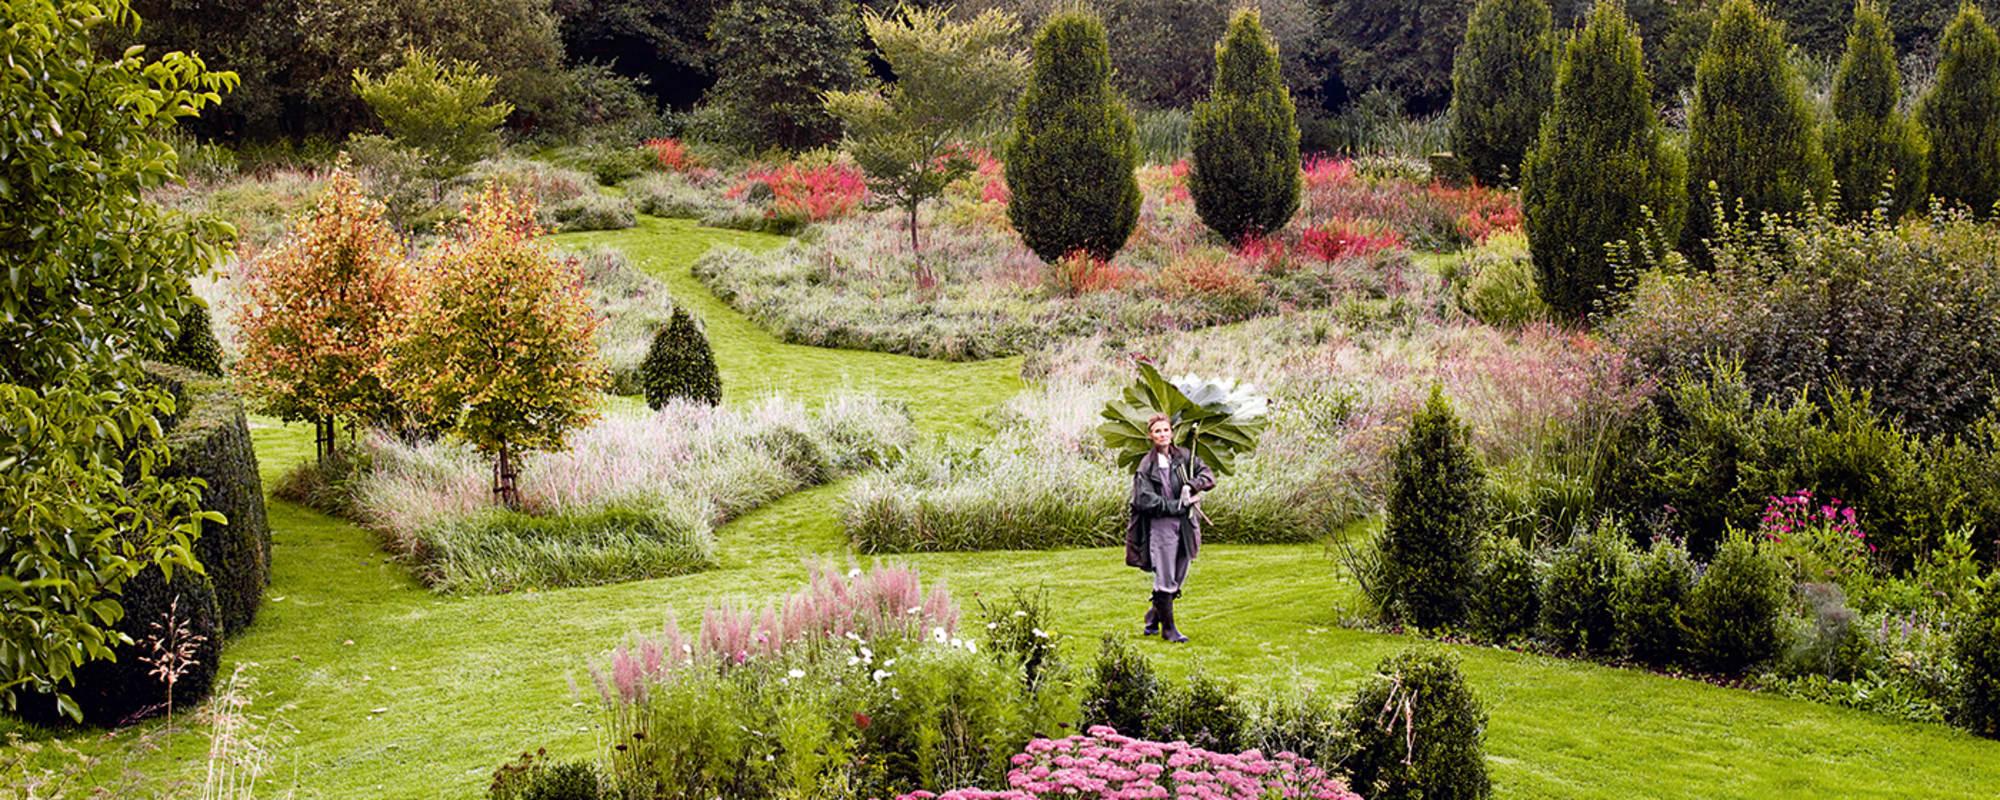 Tania Compton, Garten, Spilsbury, Natur